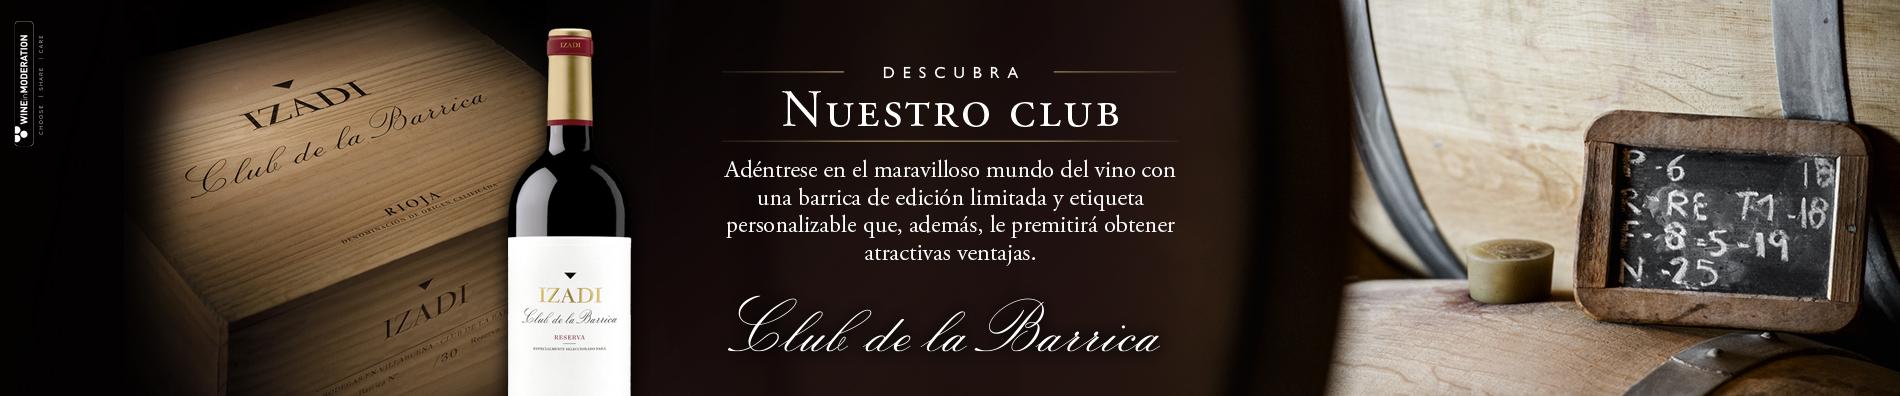 2020_09_28_Club_de_la_barrica_BANNER